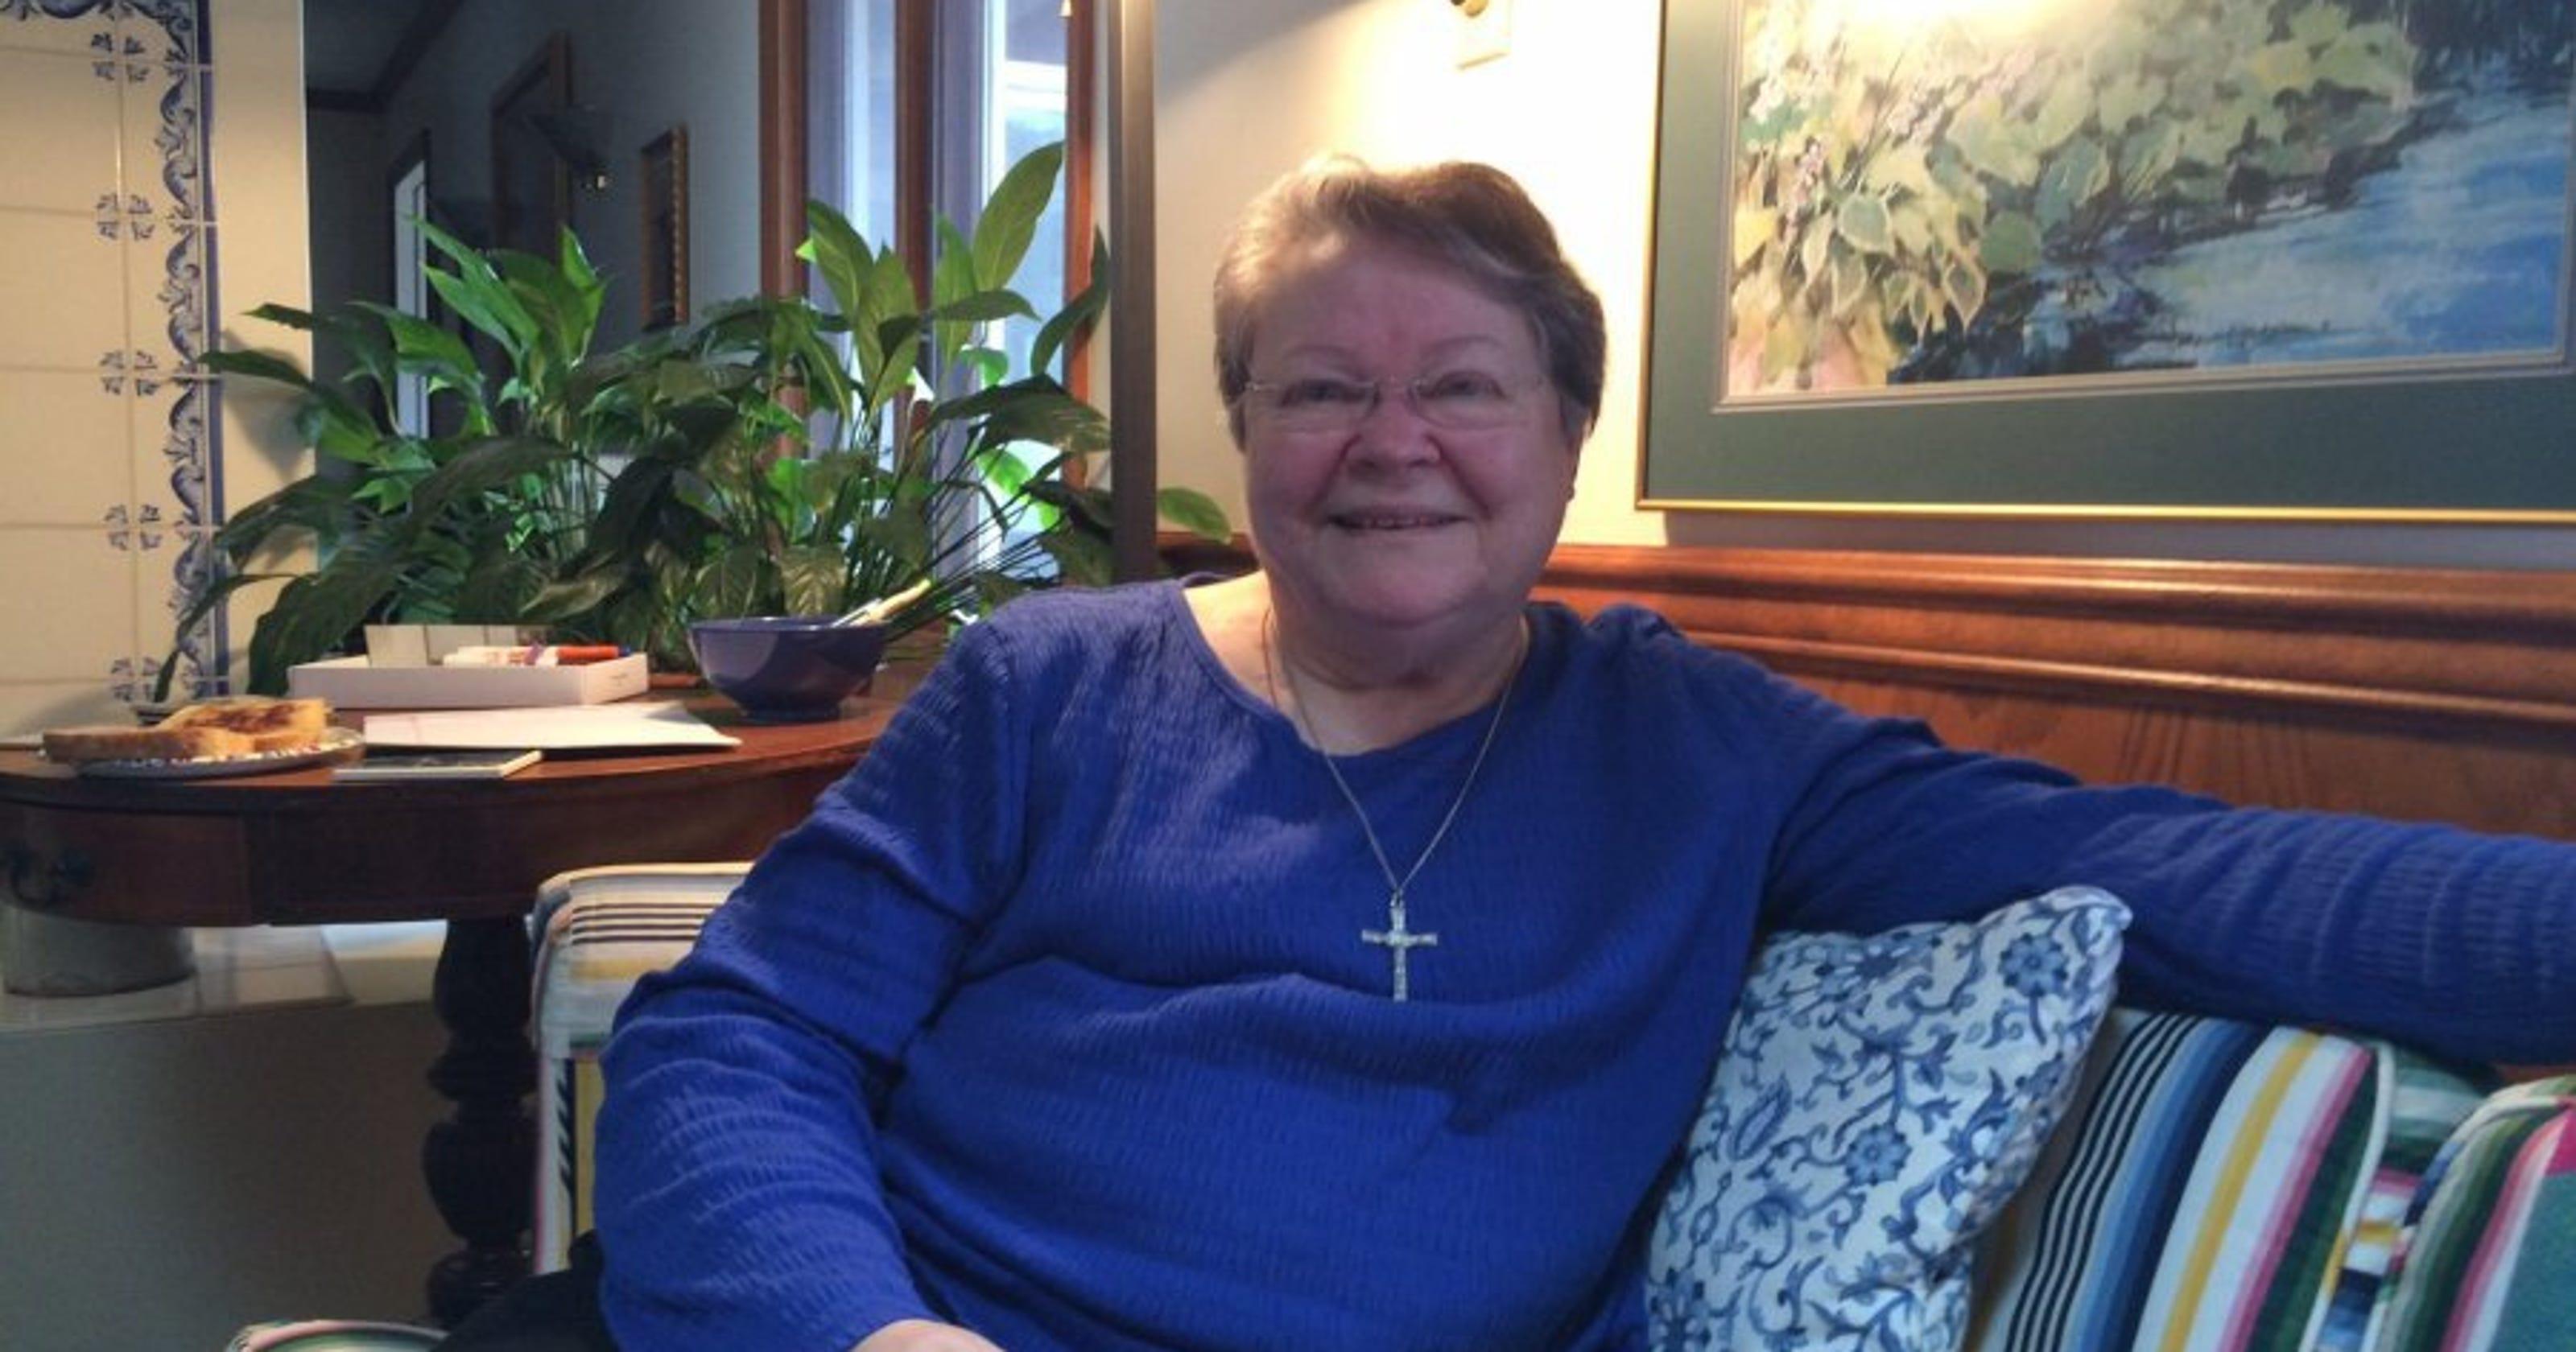 Knoxville Secular Carmelite member grew from 'oddball' to